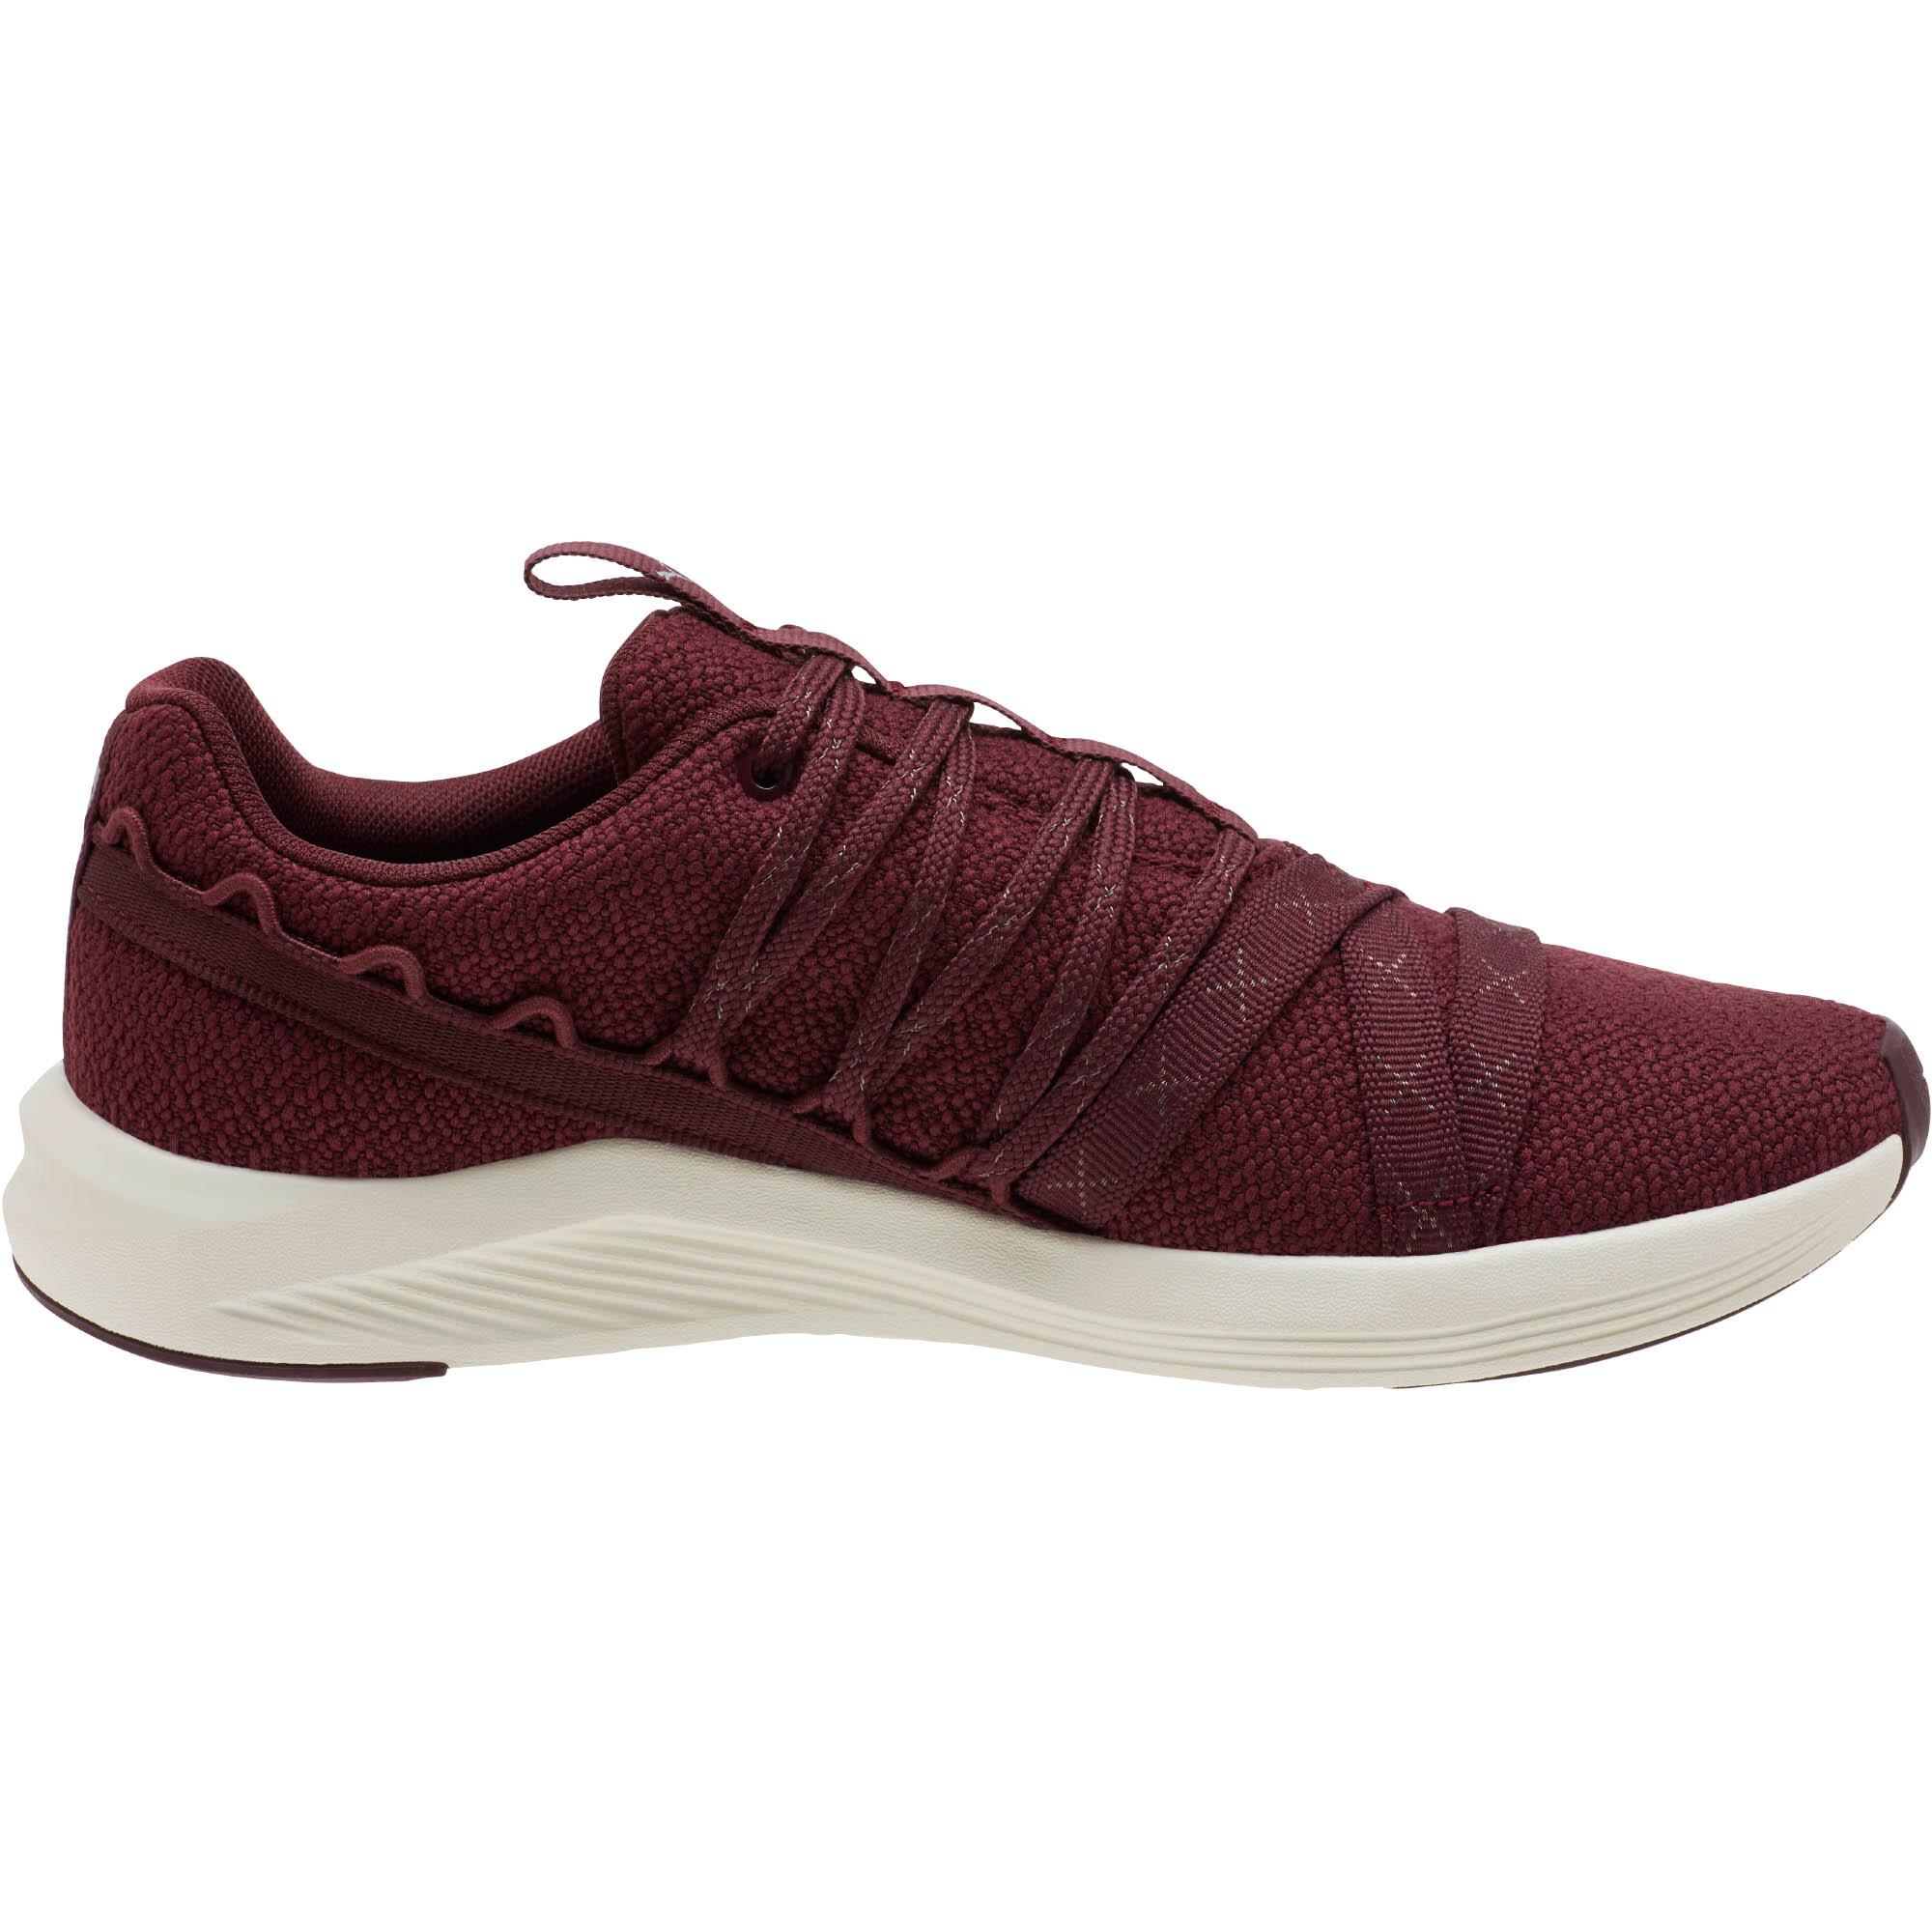 PUMA-Prowl-Alt-2-LX-Women-039-s-Training-Shoes-Women-Shoe-Training thumbnail 5